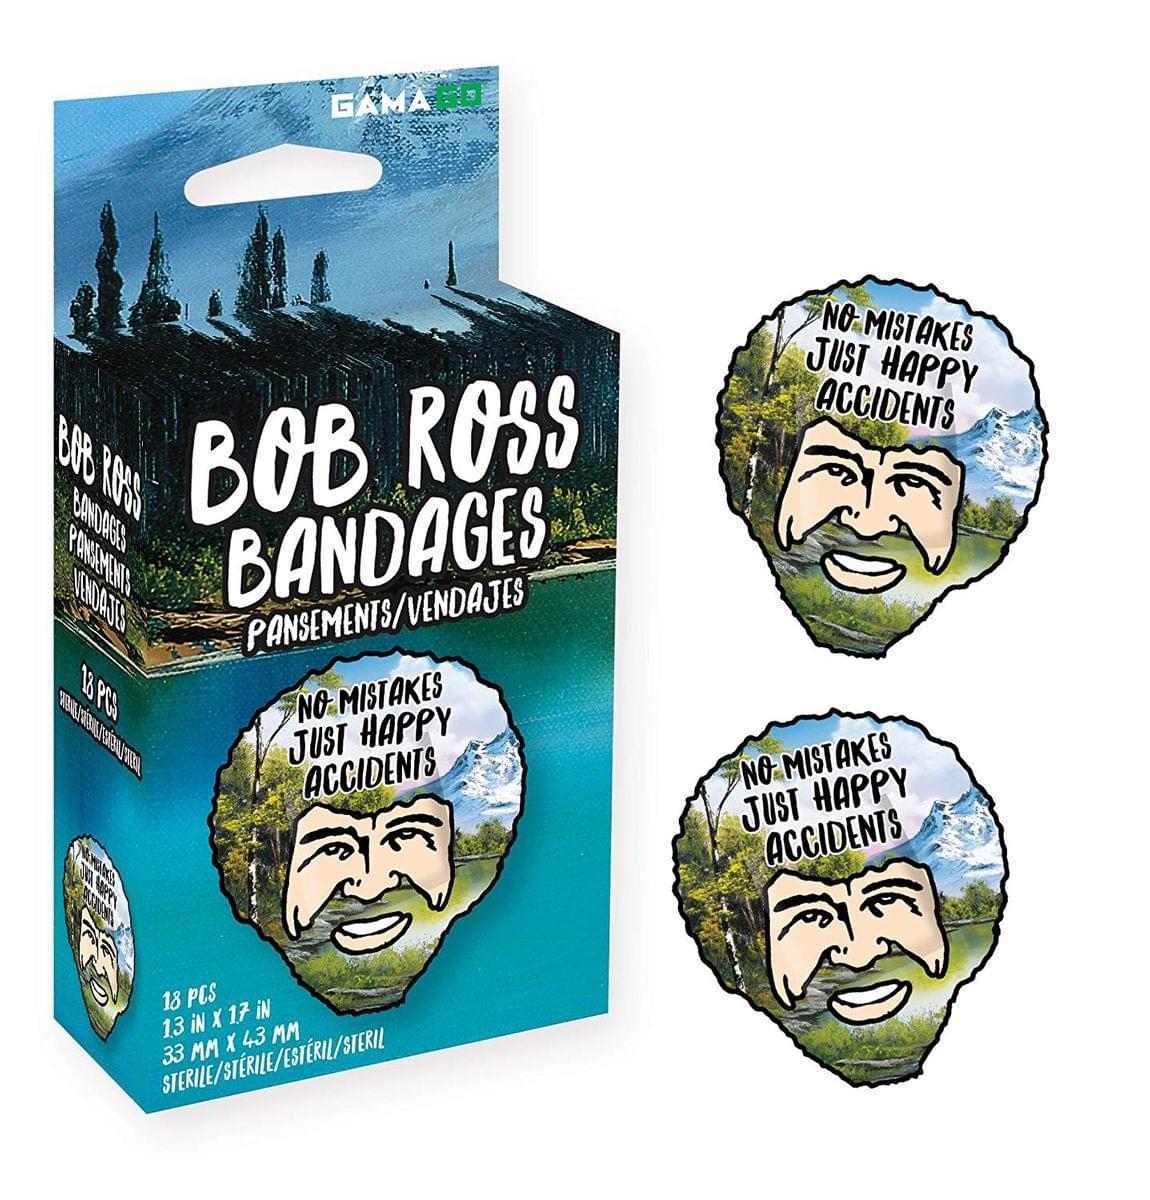 Bob Ross Bandages, 18 Pieces